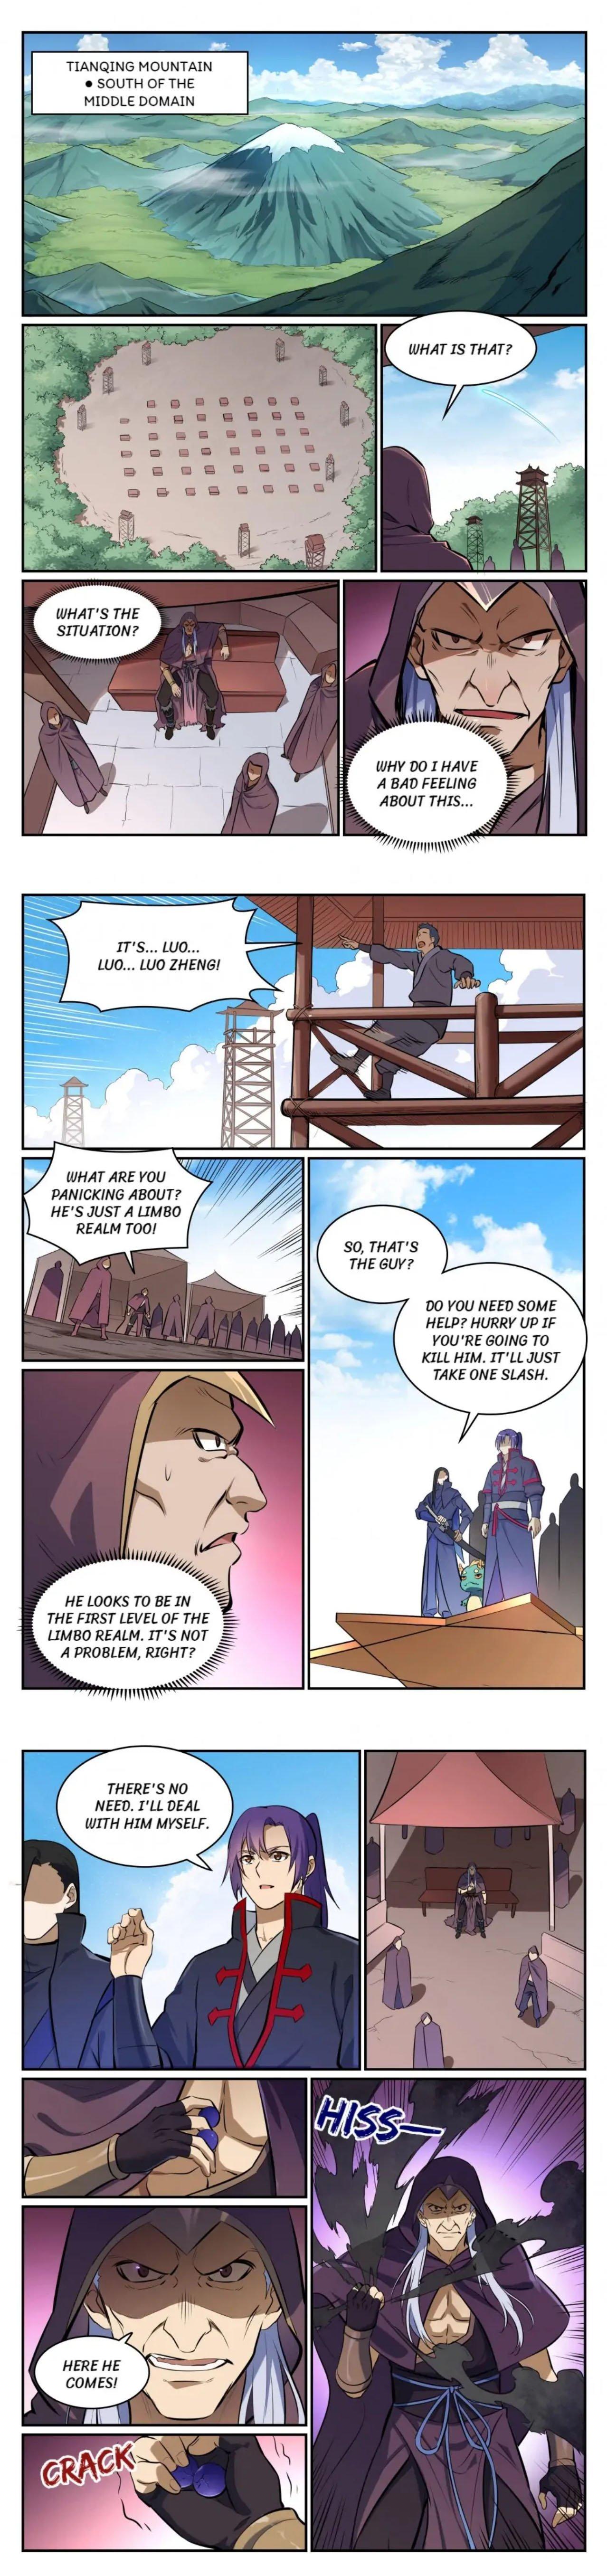 Manga Apotheosis - Chapter 461 Page 3